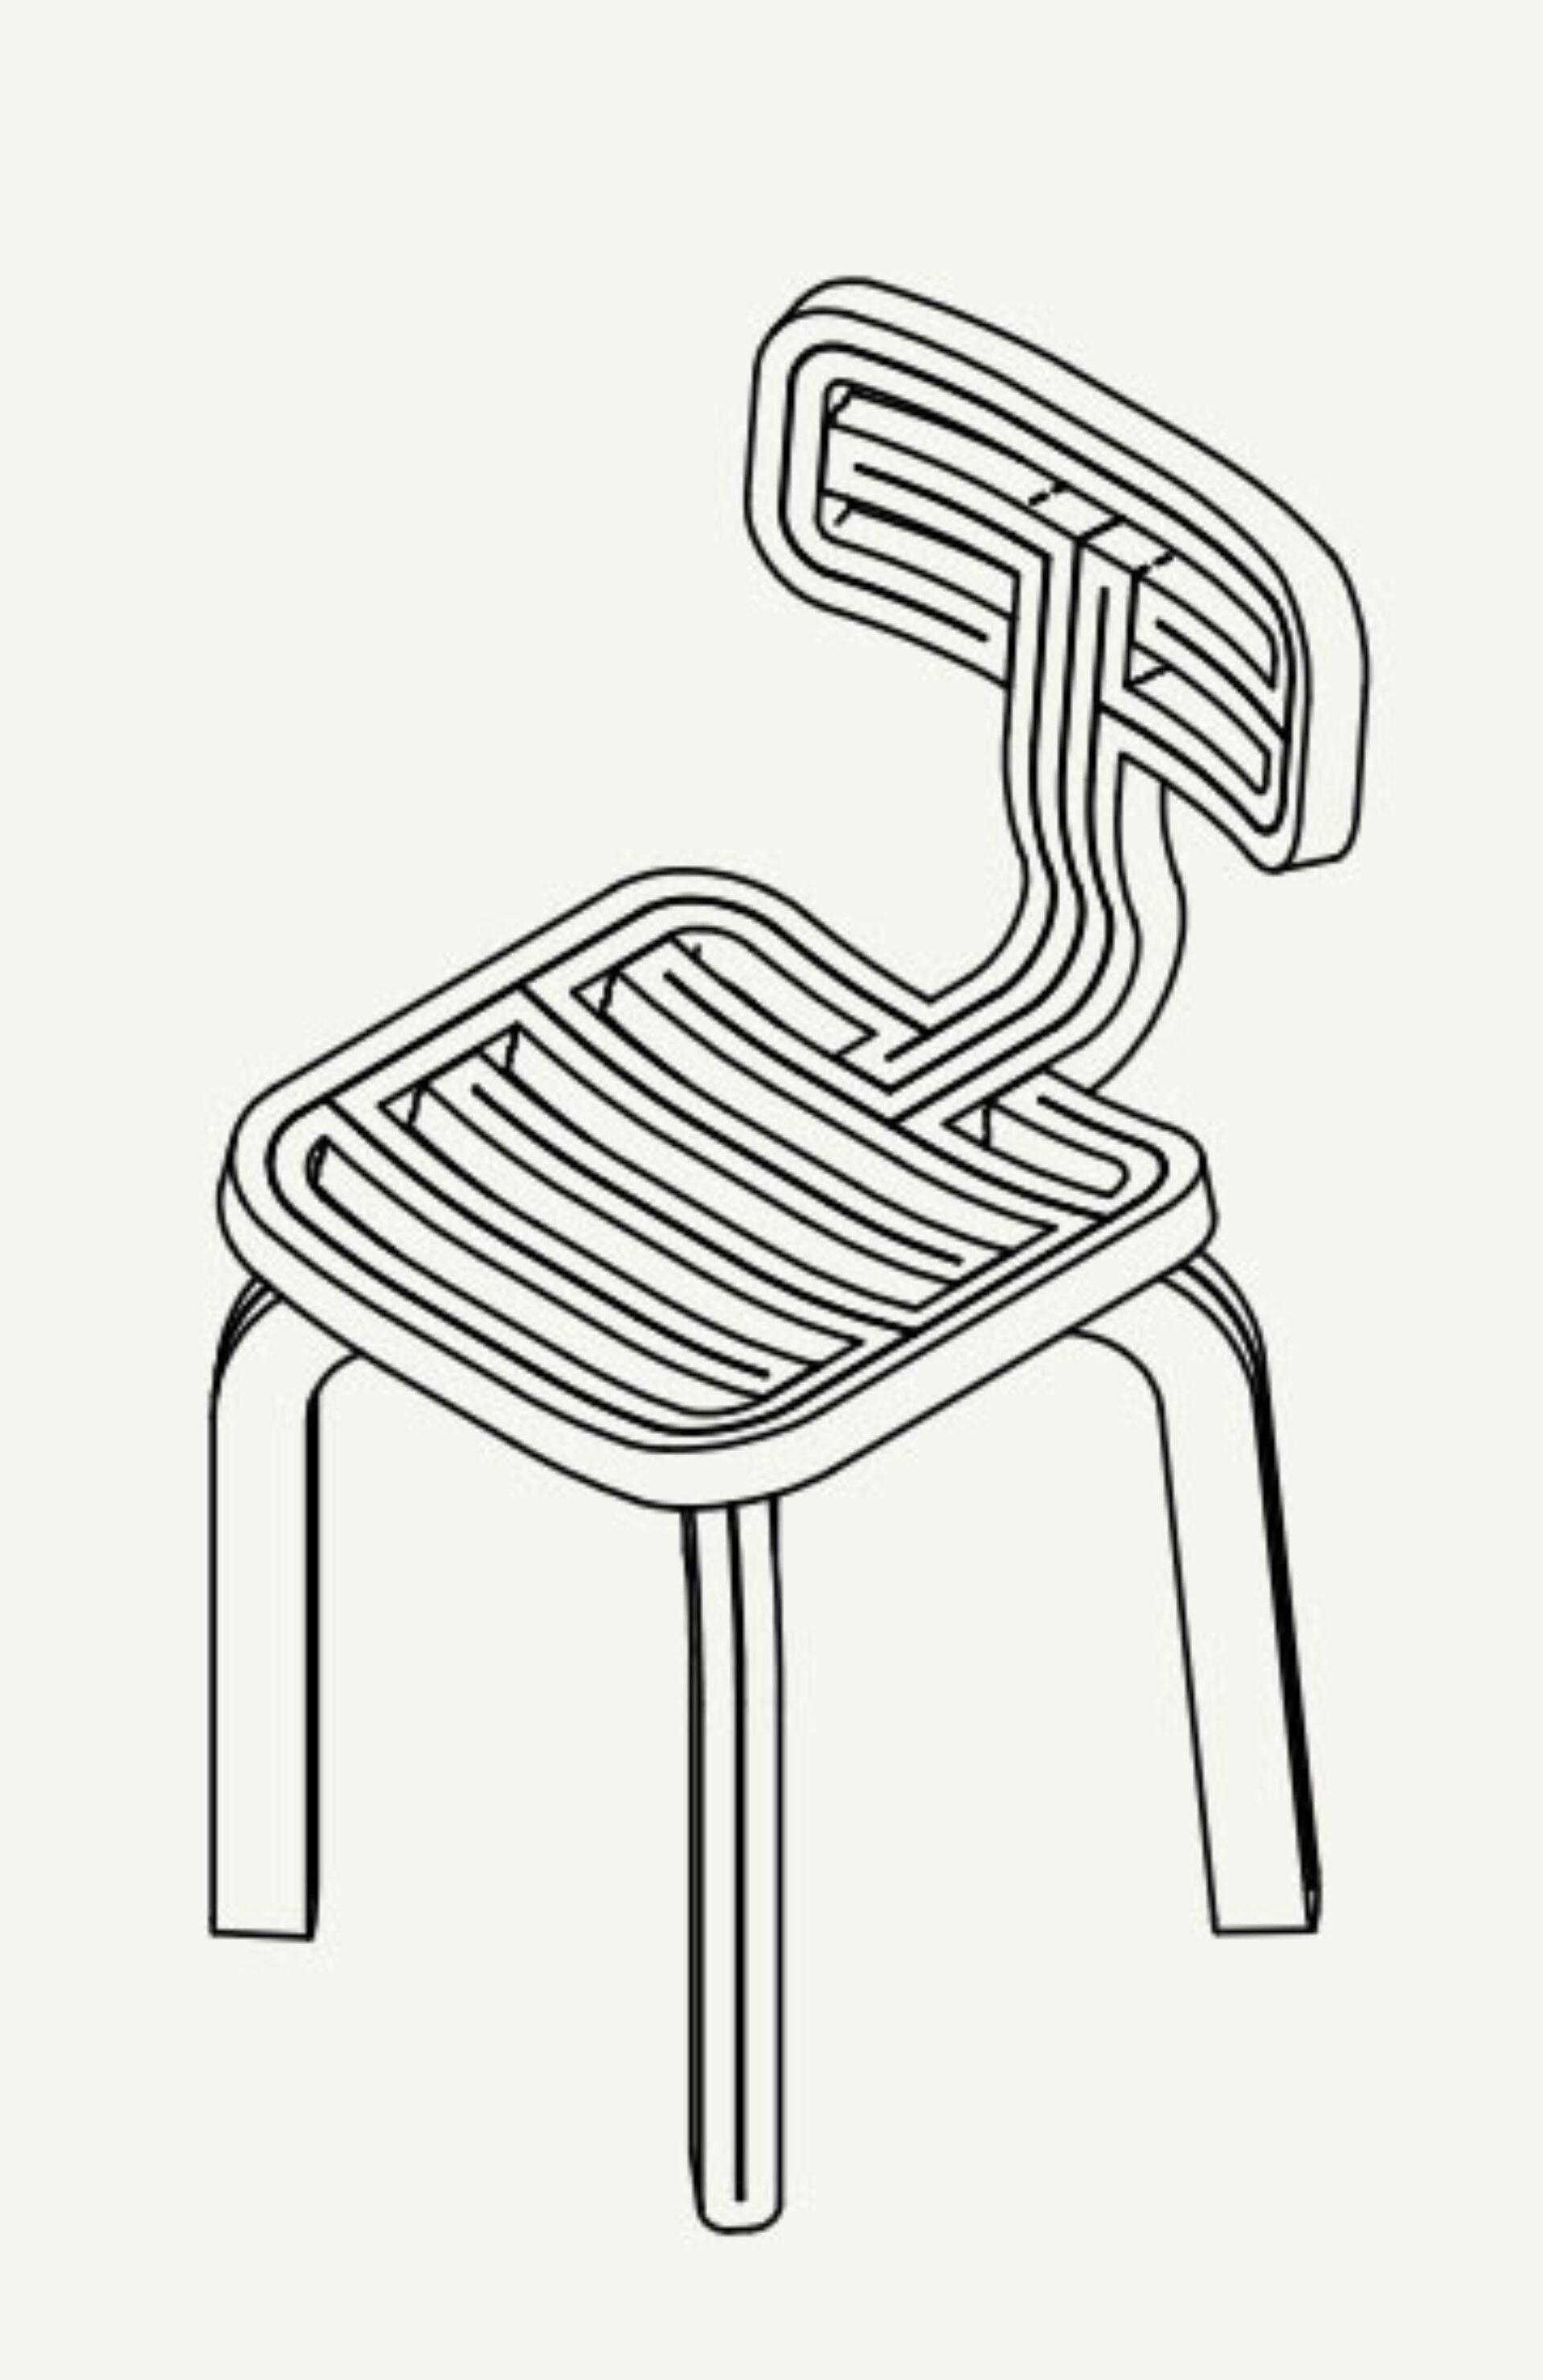 1 chubby chair